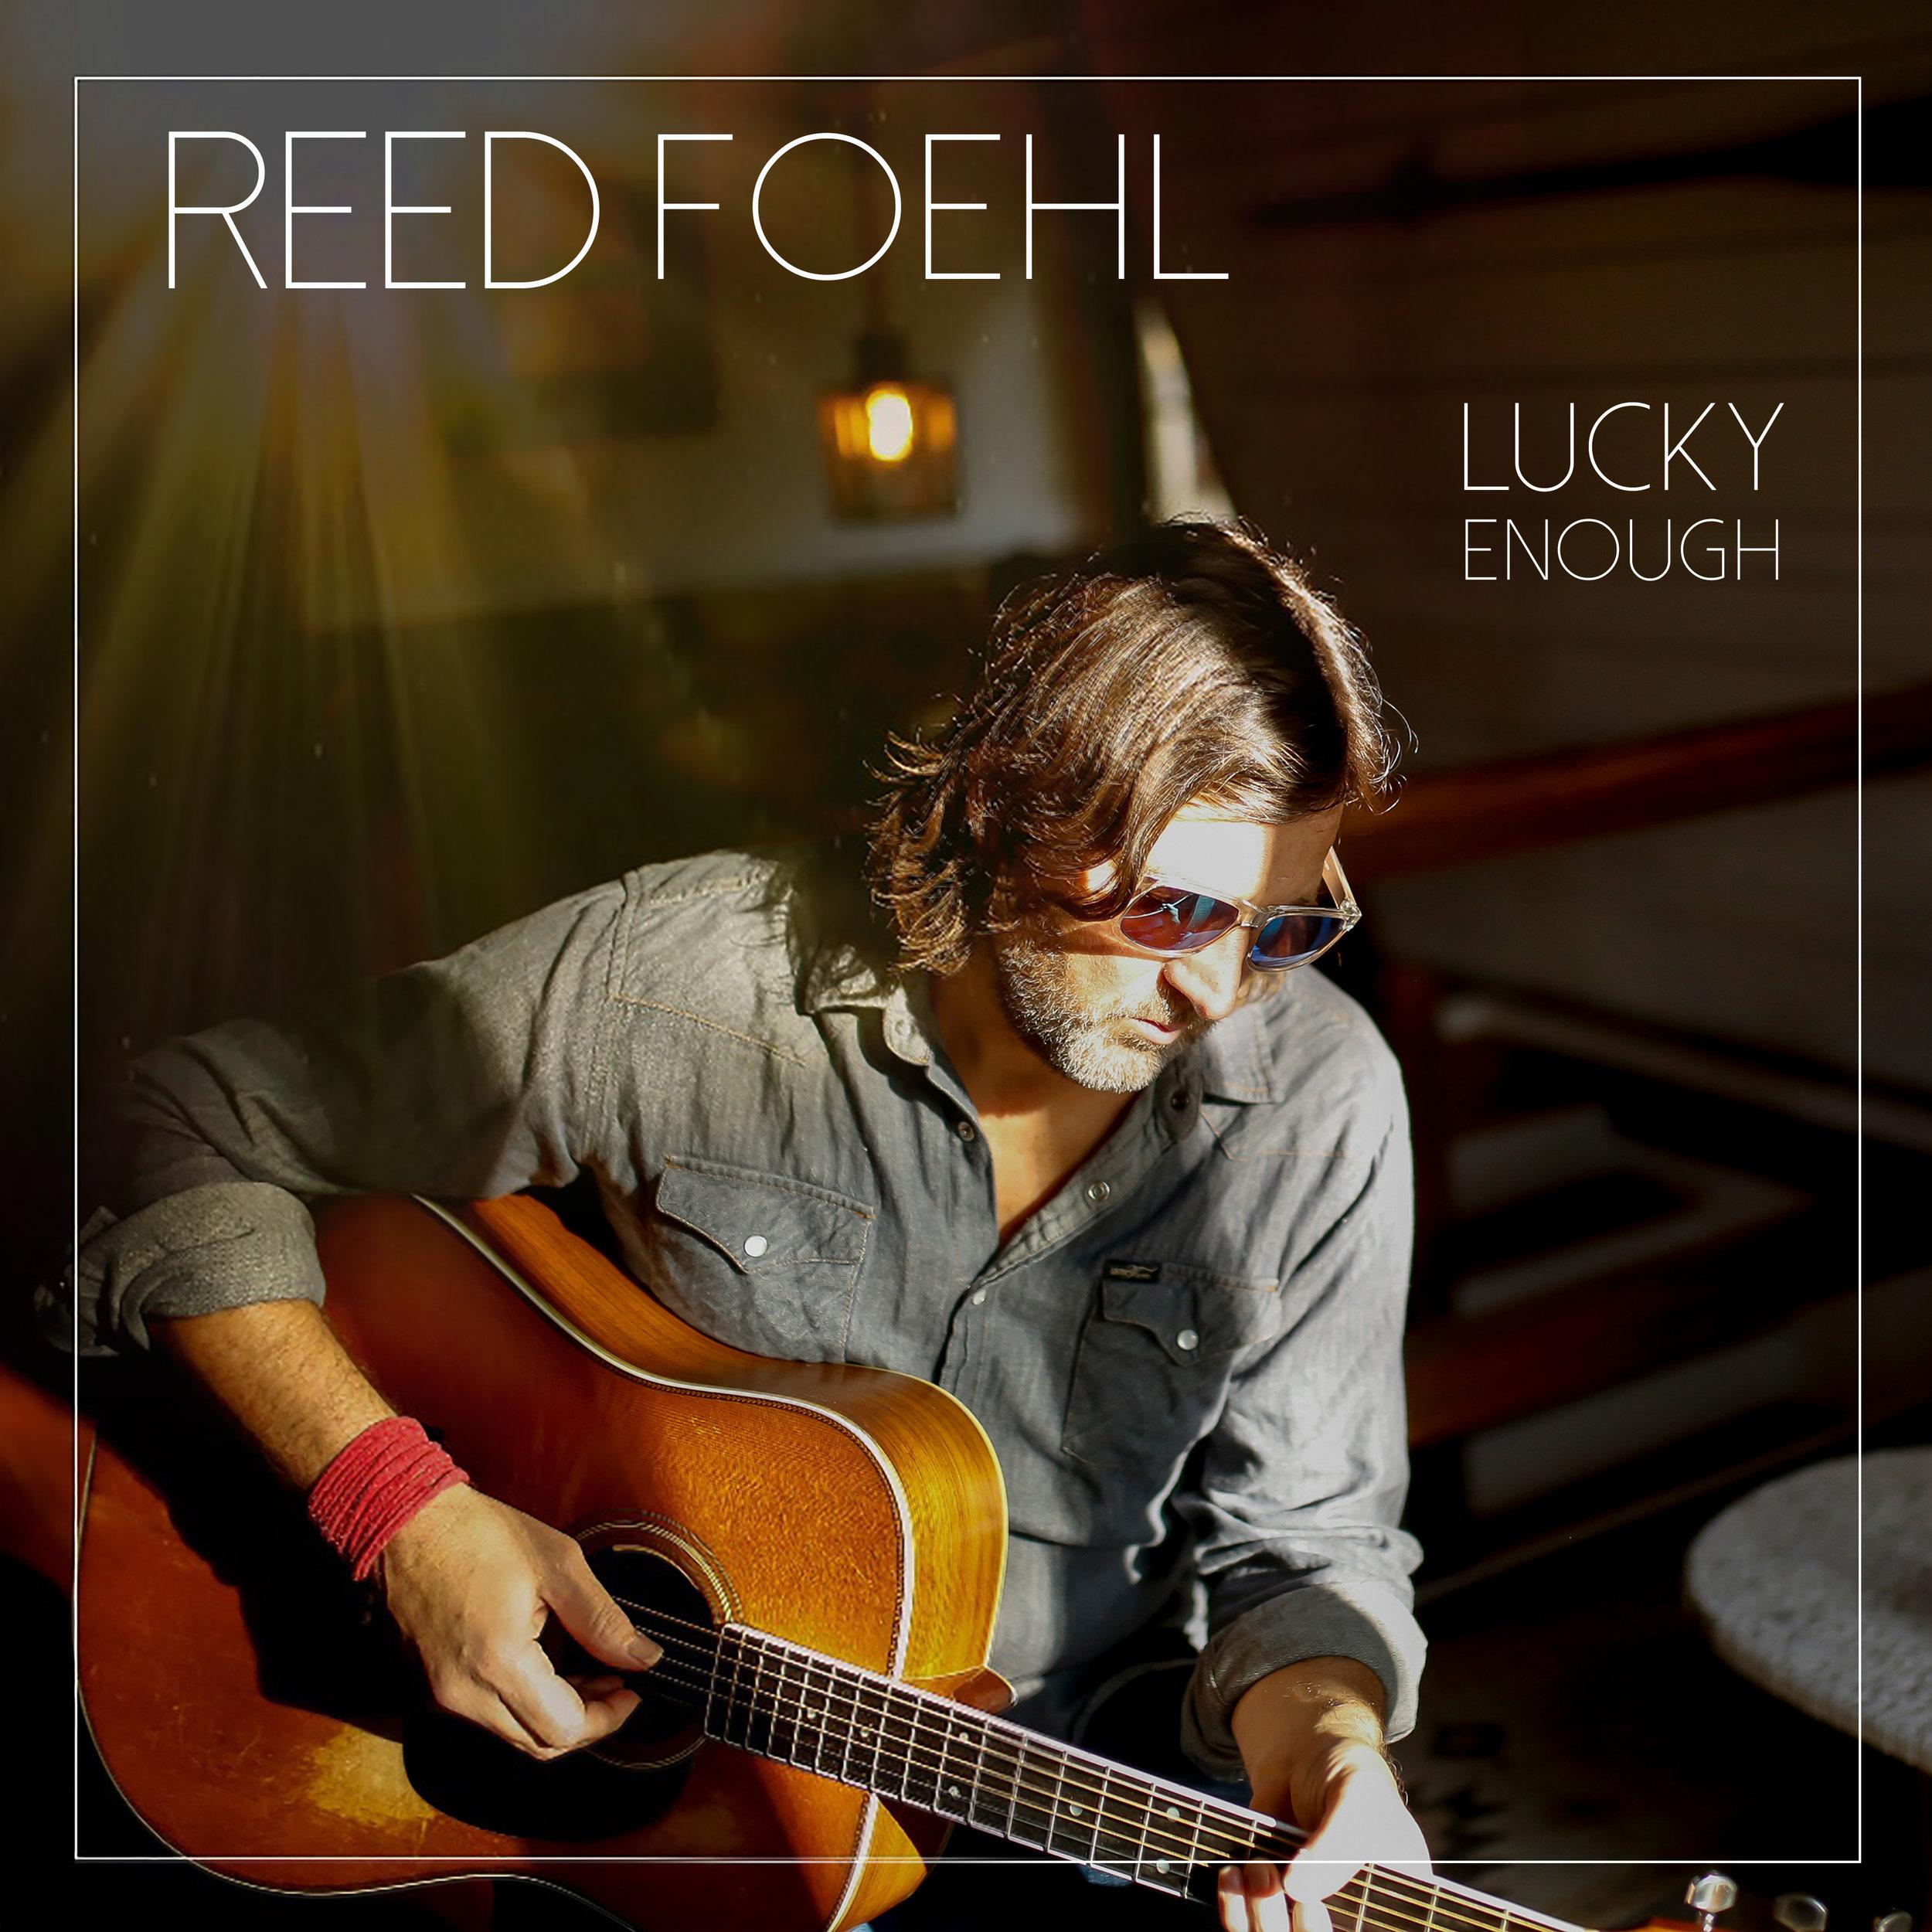 ReedFoehl_LuckyEnough_13x13_cover.jpg